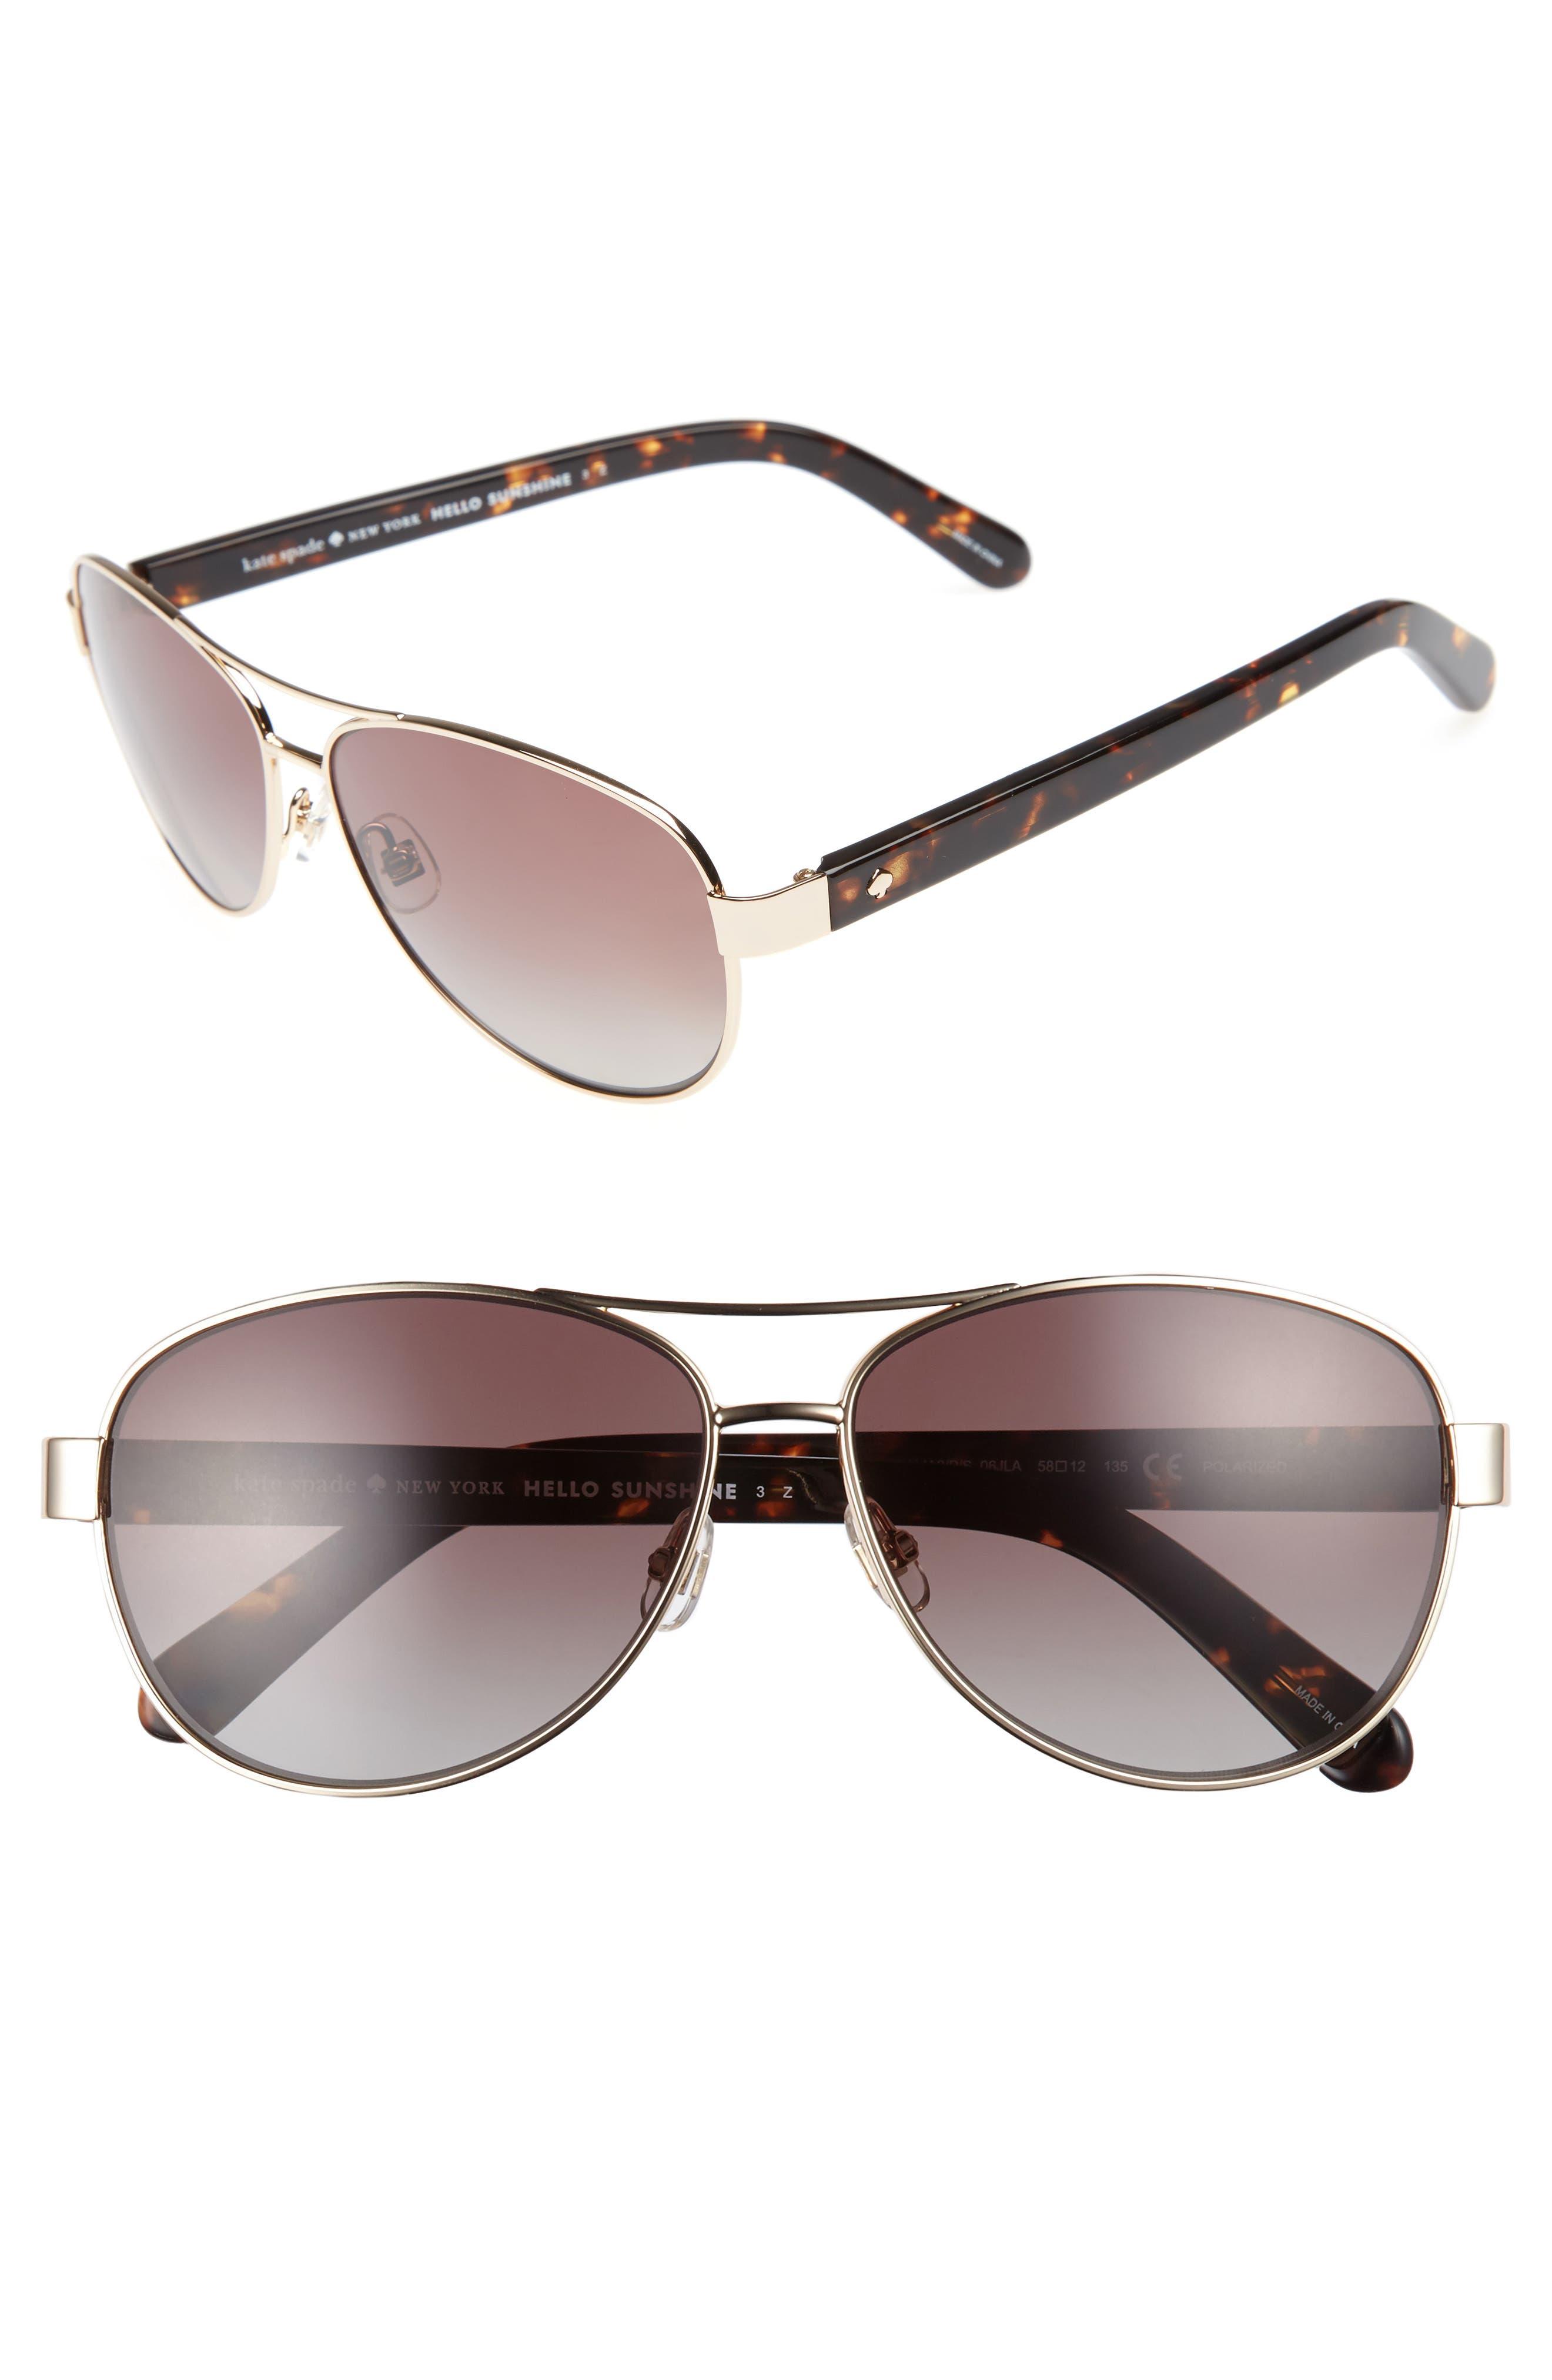 Main Image - kate spade new york 'dalia' 58mm polarized aviator sunglasses